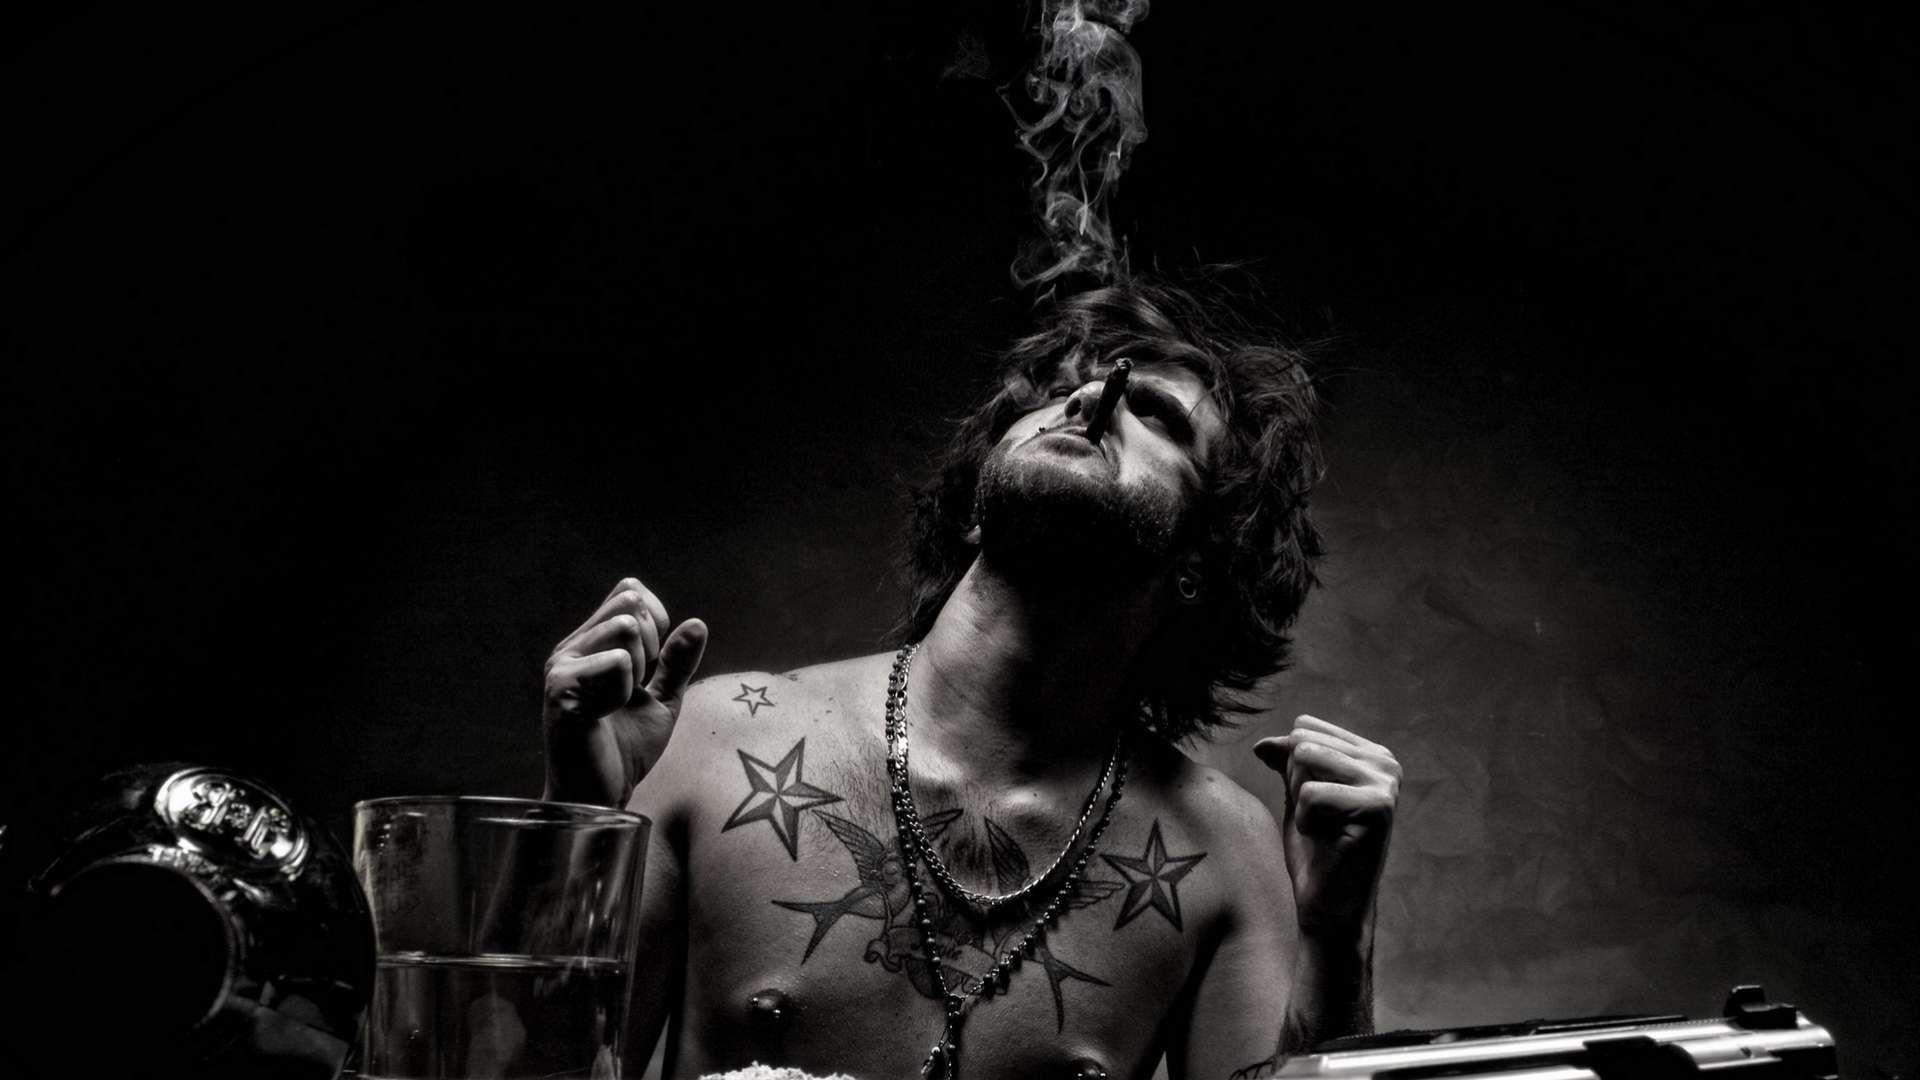 Hd wallpaper black and white - Hd Wallpaper Man Cigar Weapons Black White 1080p